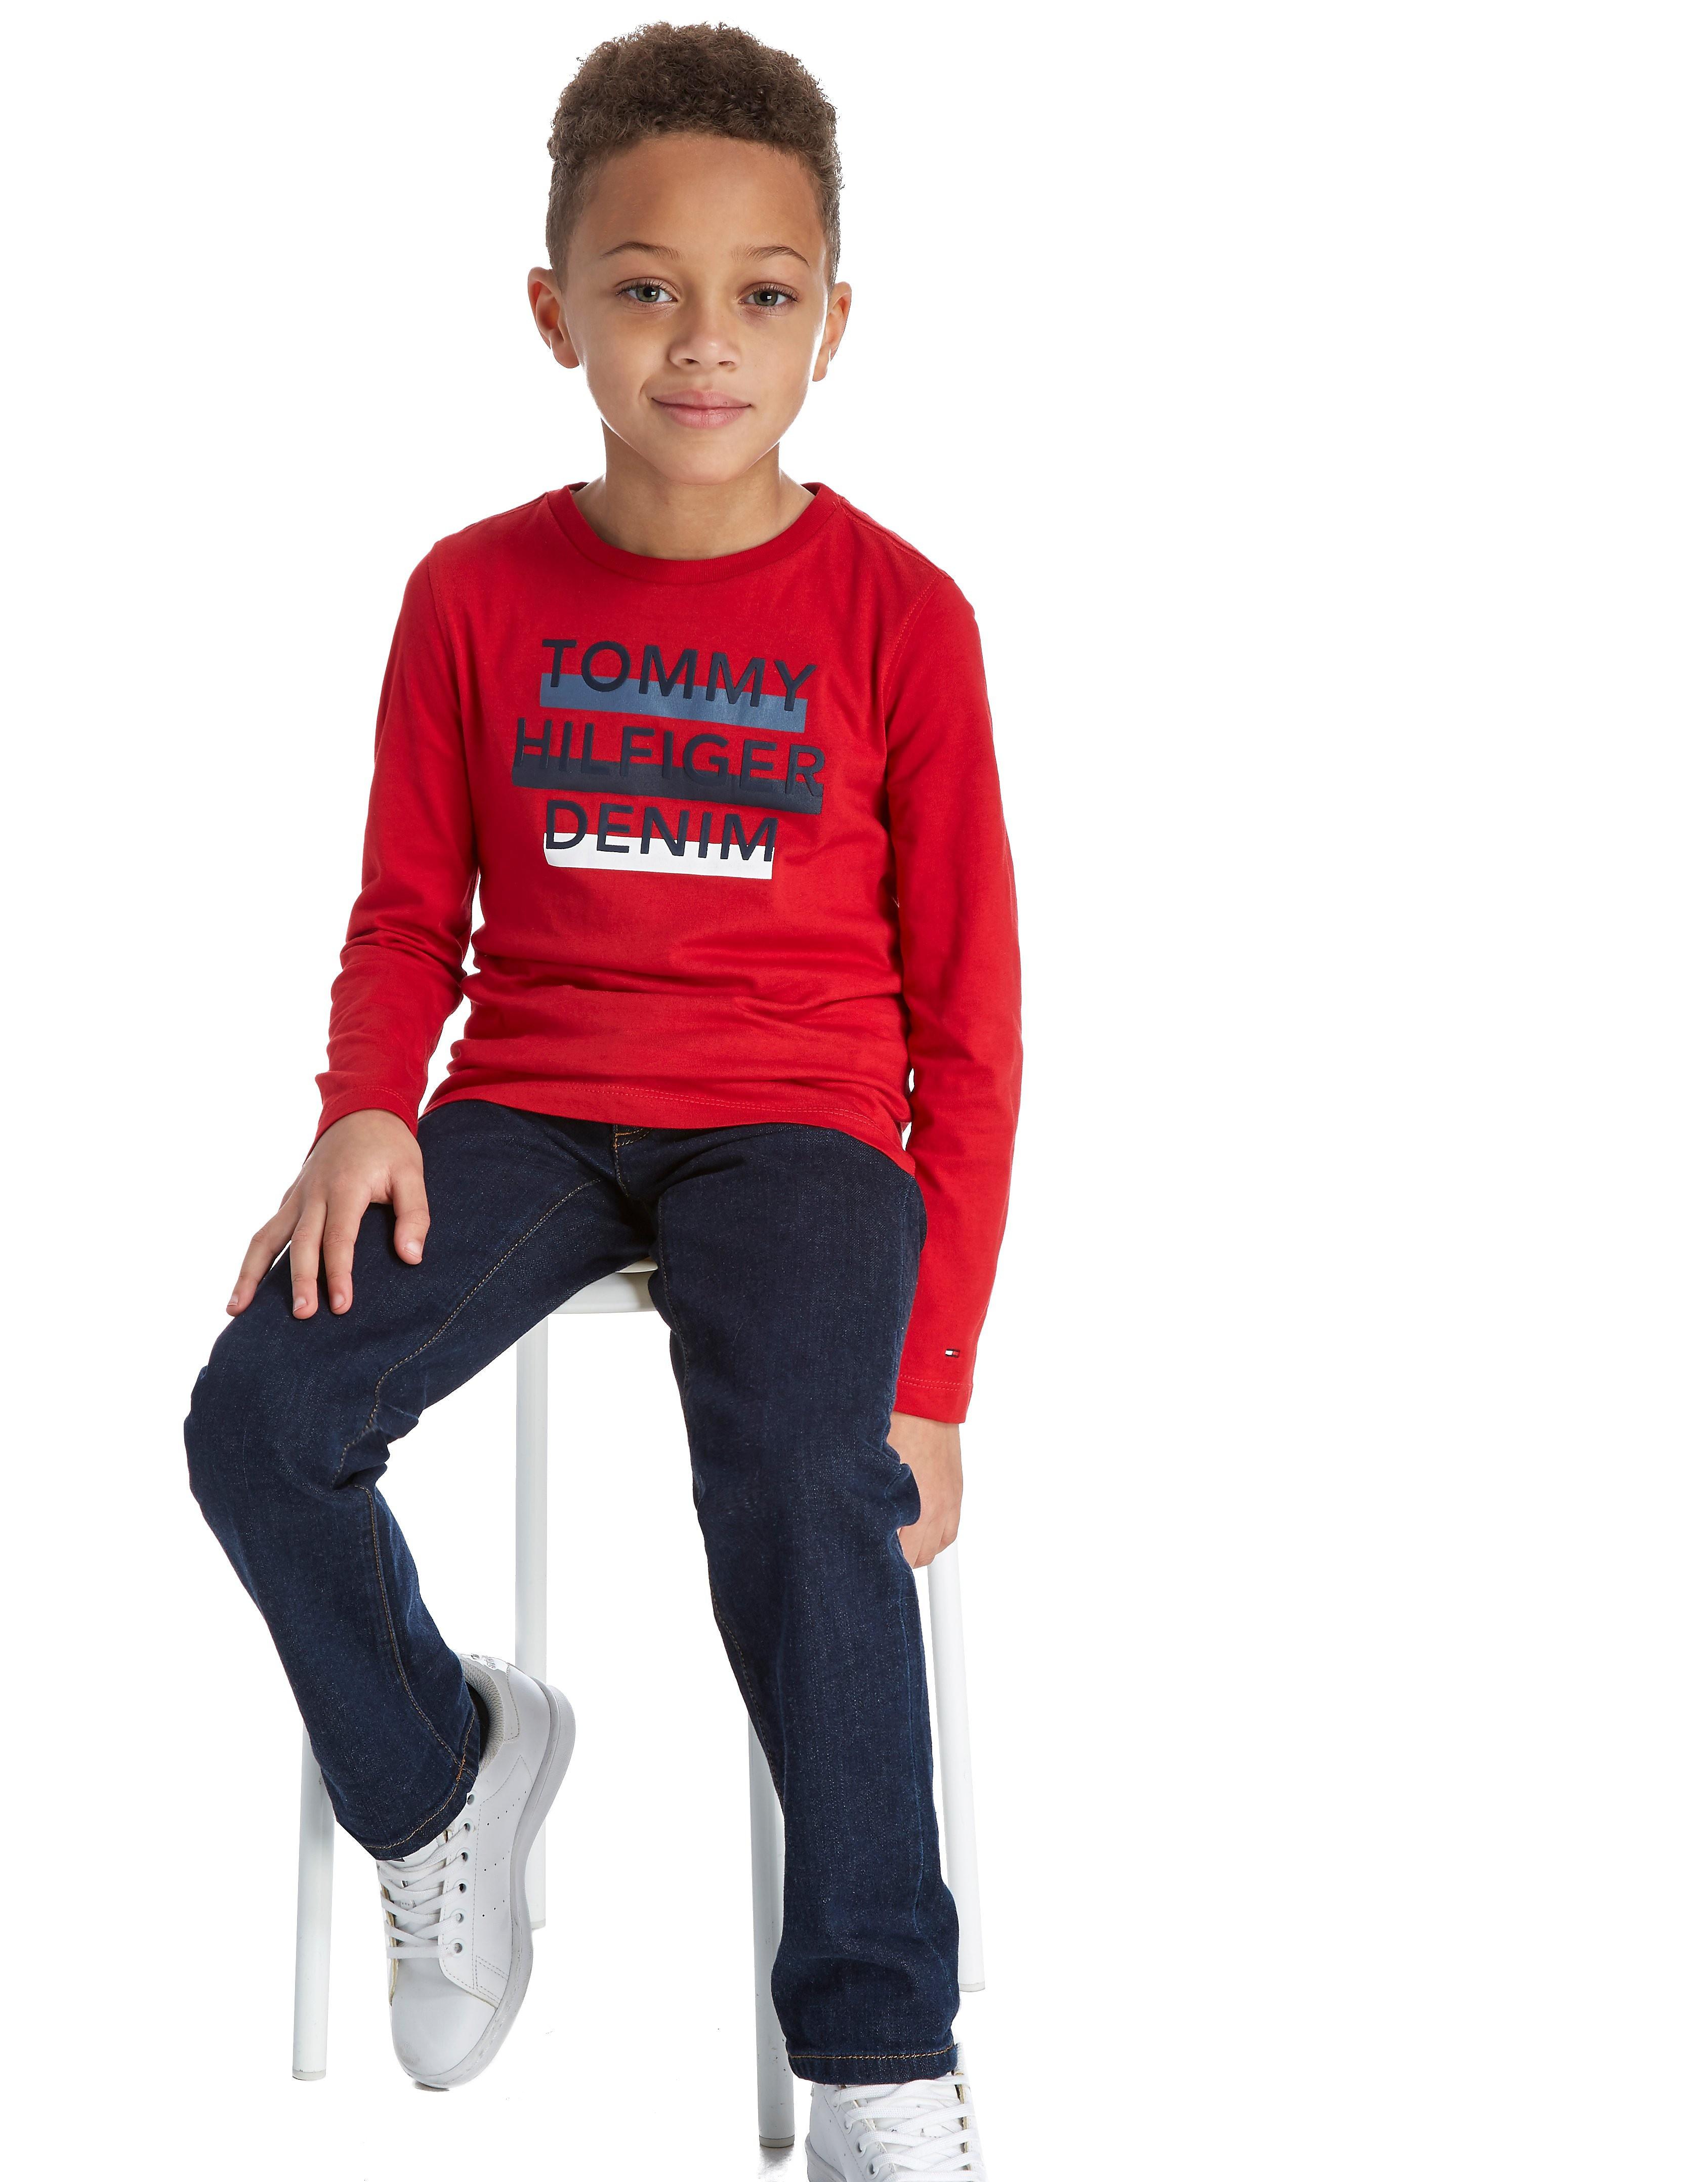 Tommy Hilfiger Long Sleeve Flag T-Shirt Children